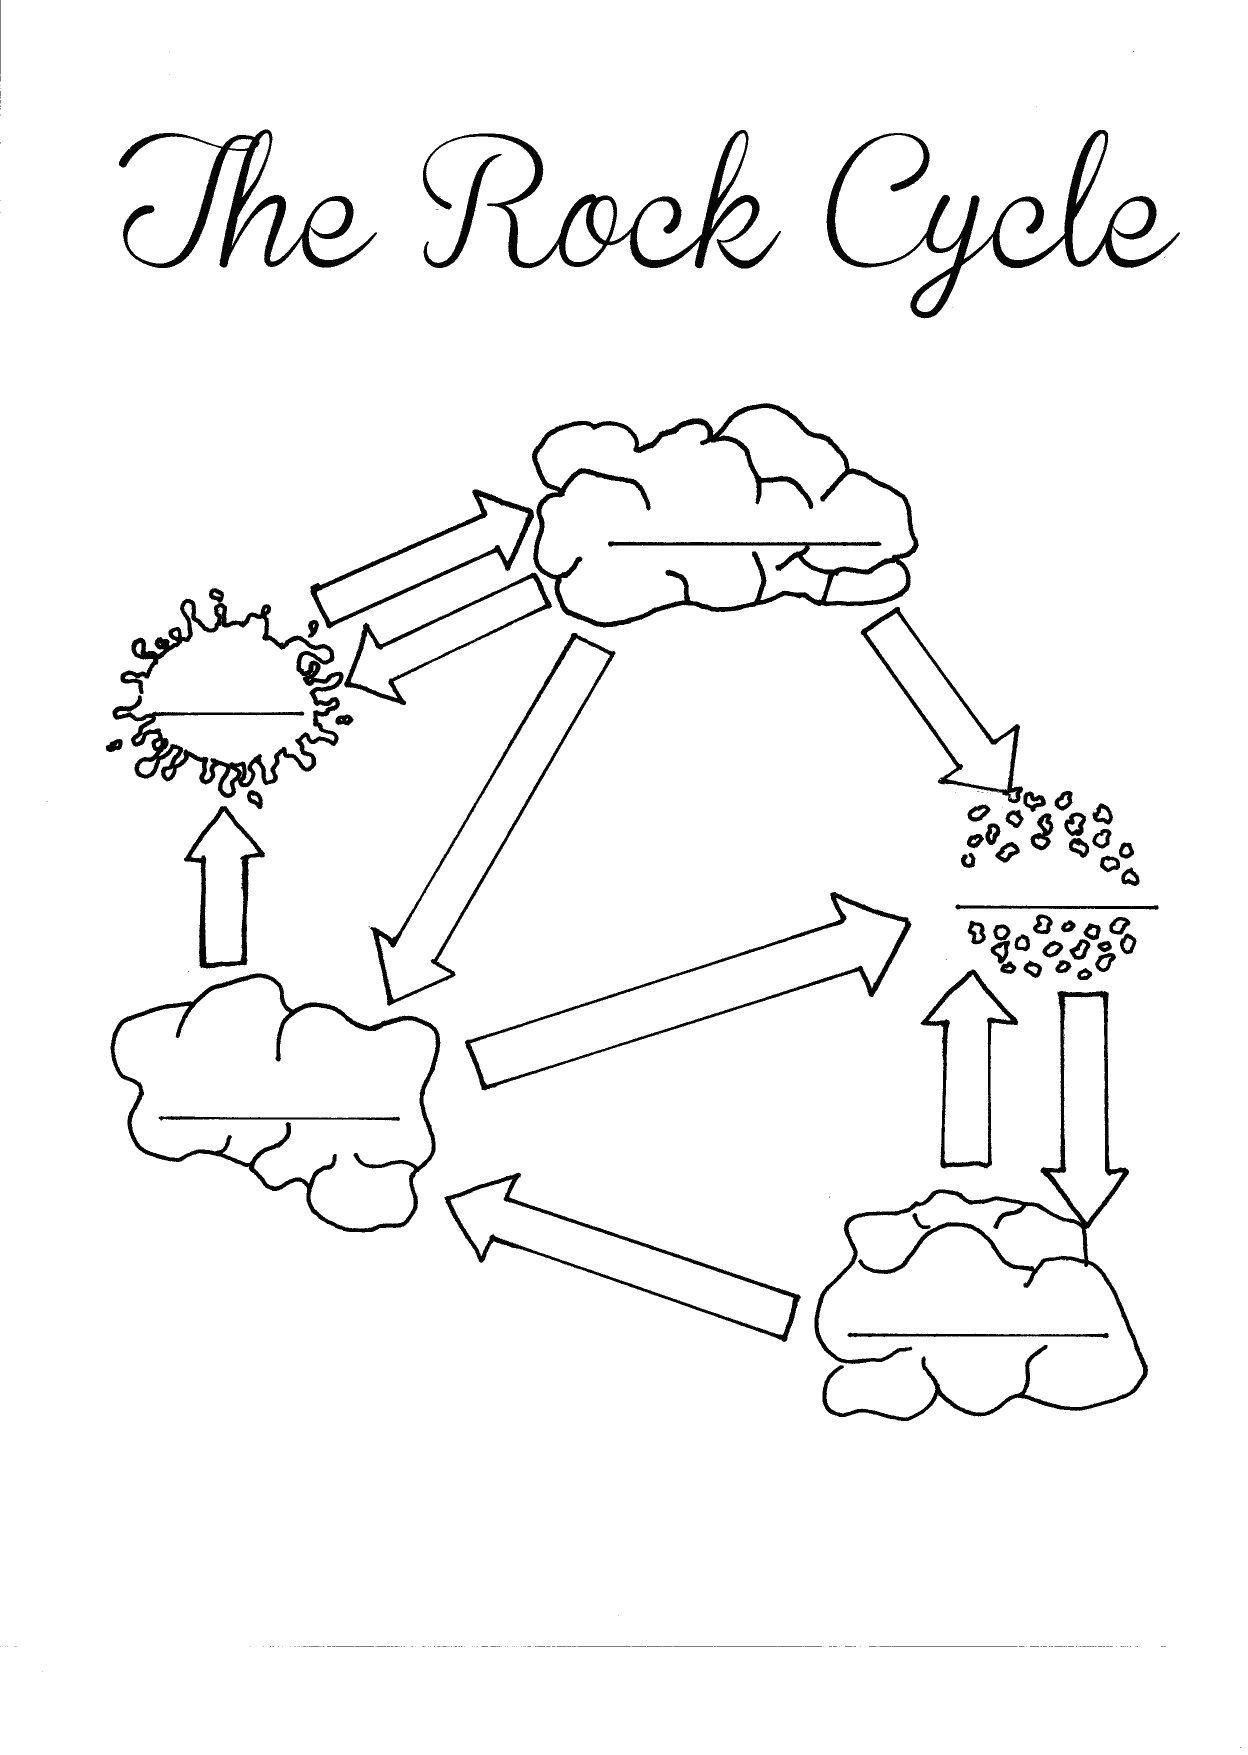 Carbon Cycle Diagram Worksheet Rock Cycle Fill In The Blank Diagram Diagram Base Website Rock Cycle Rock Cycle Project Rock Cycle For Kids